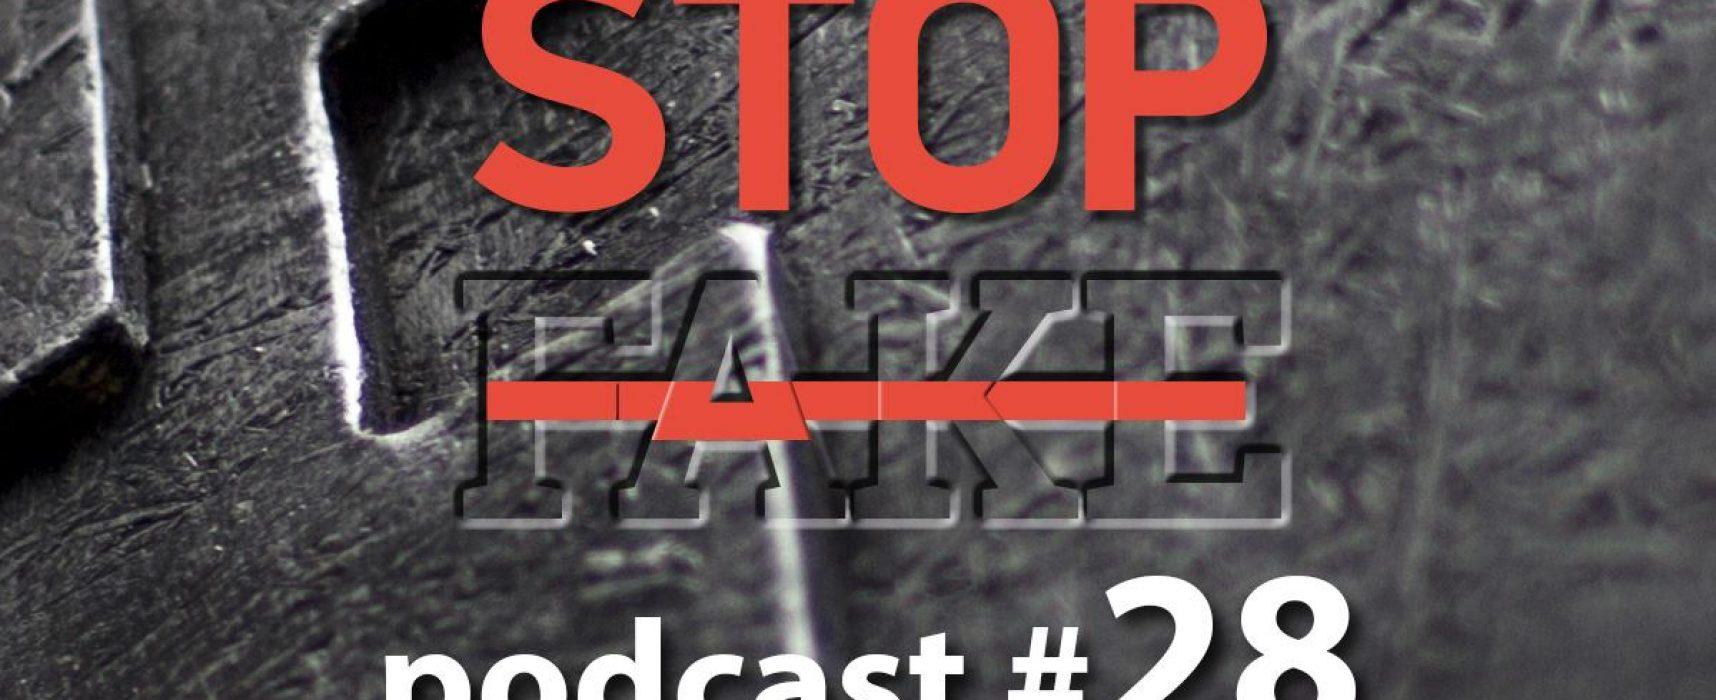 StopFake podcast #28